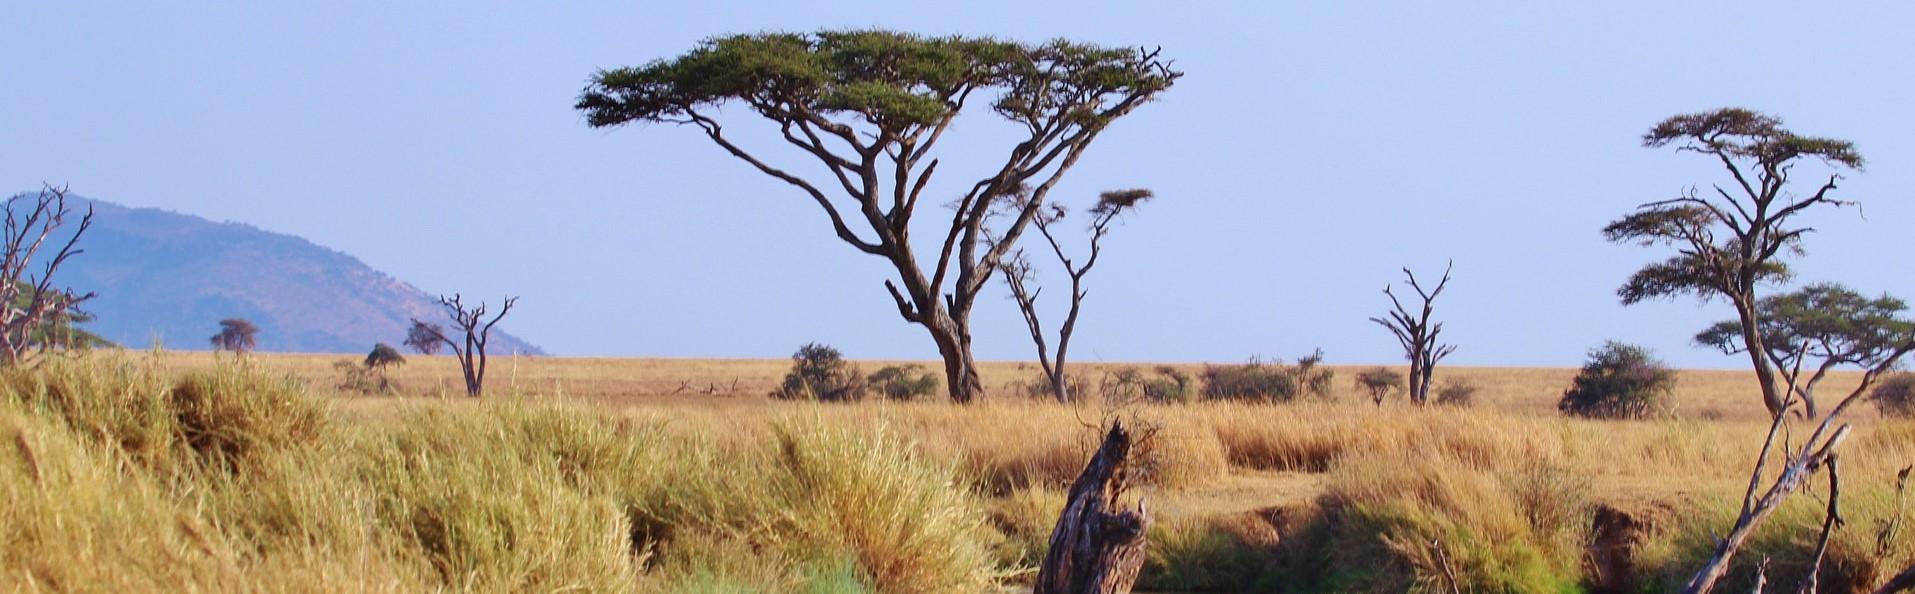 Best of Tanzania & Spice Island (Zanzibar)